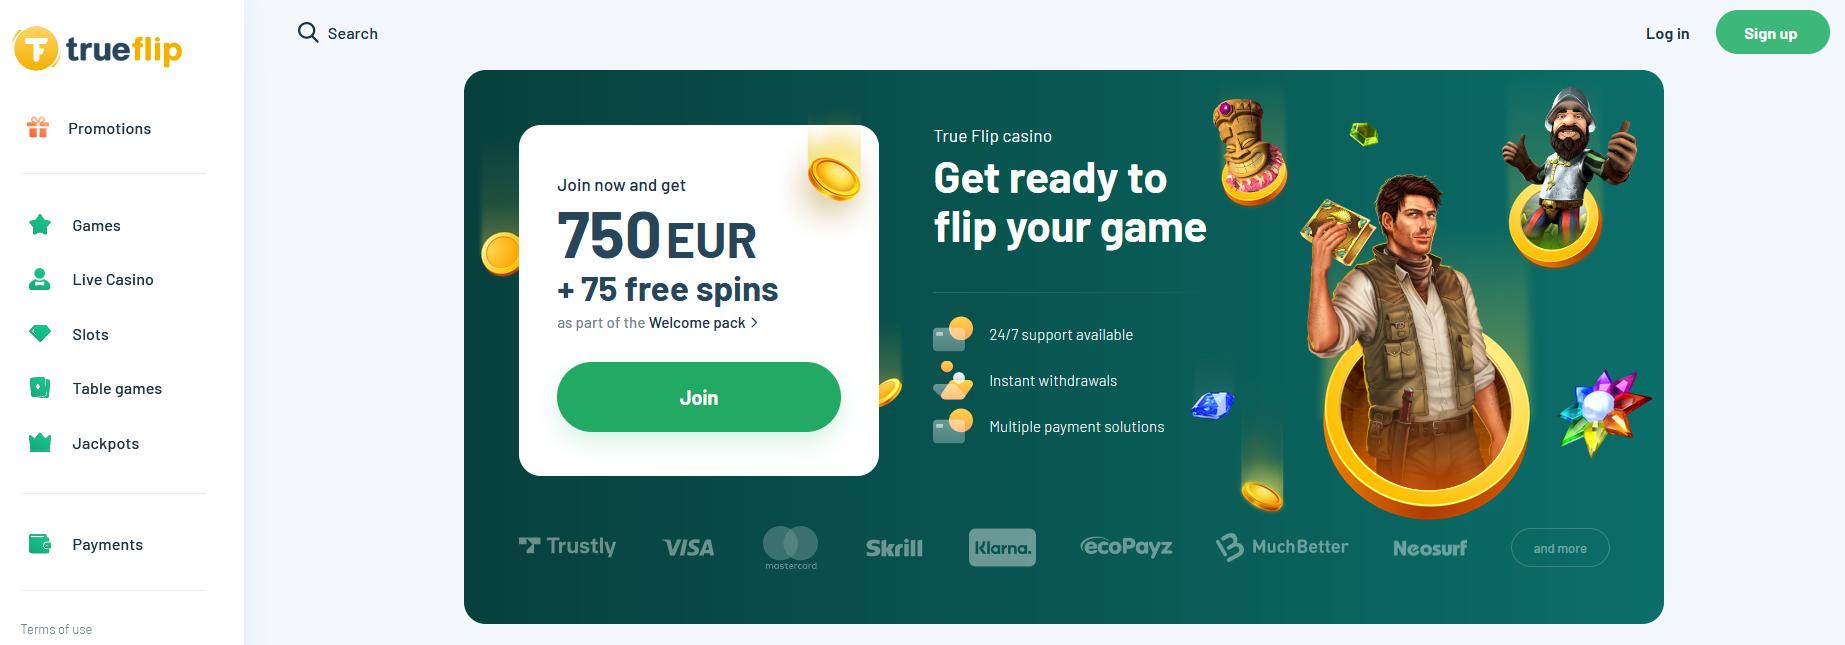 Trueflip.com Freespins